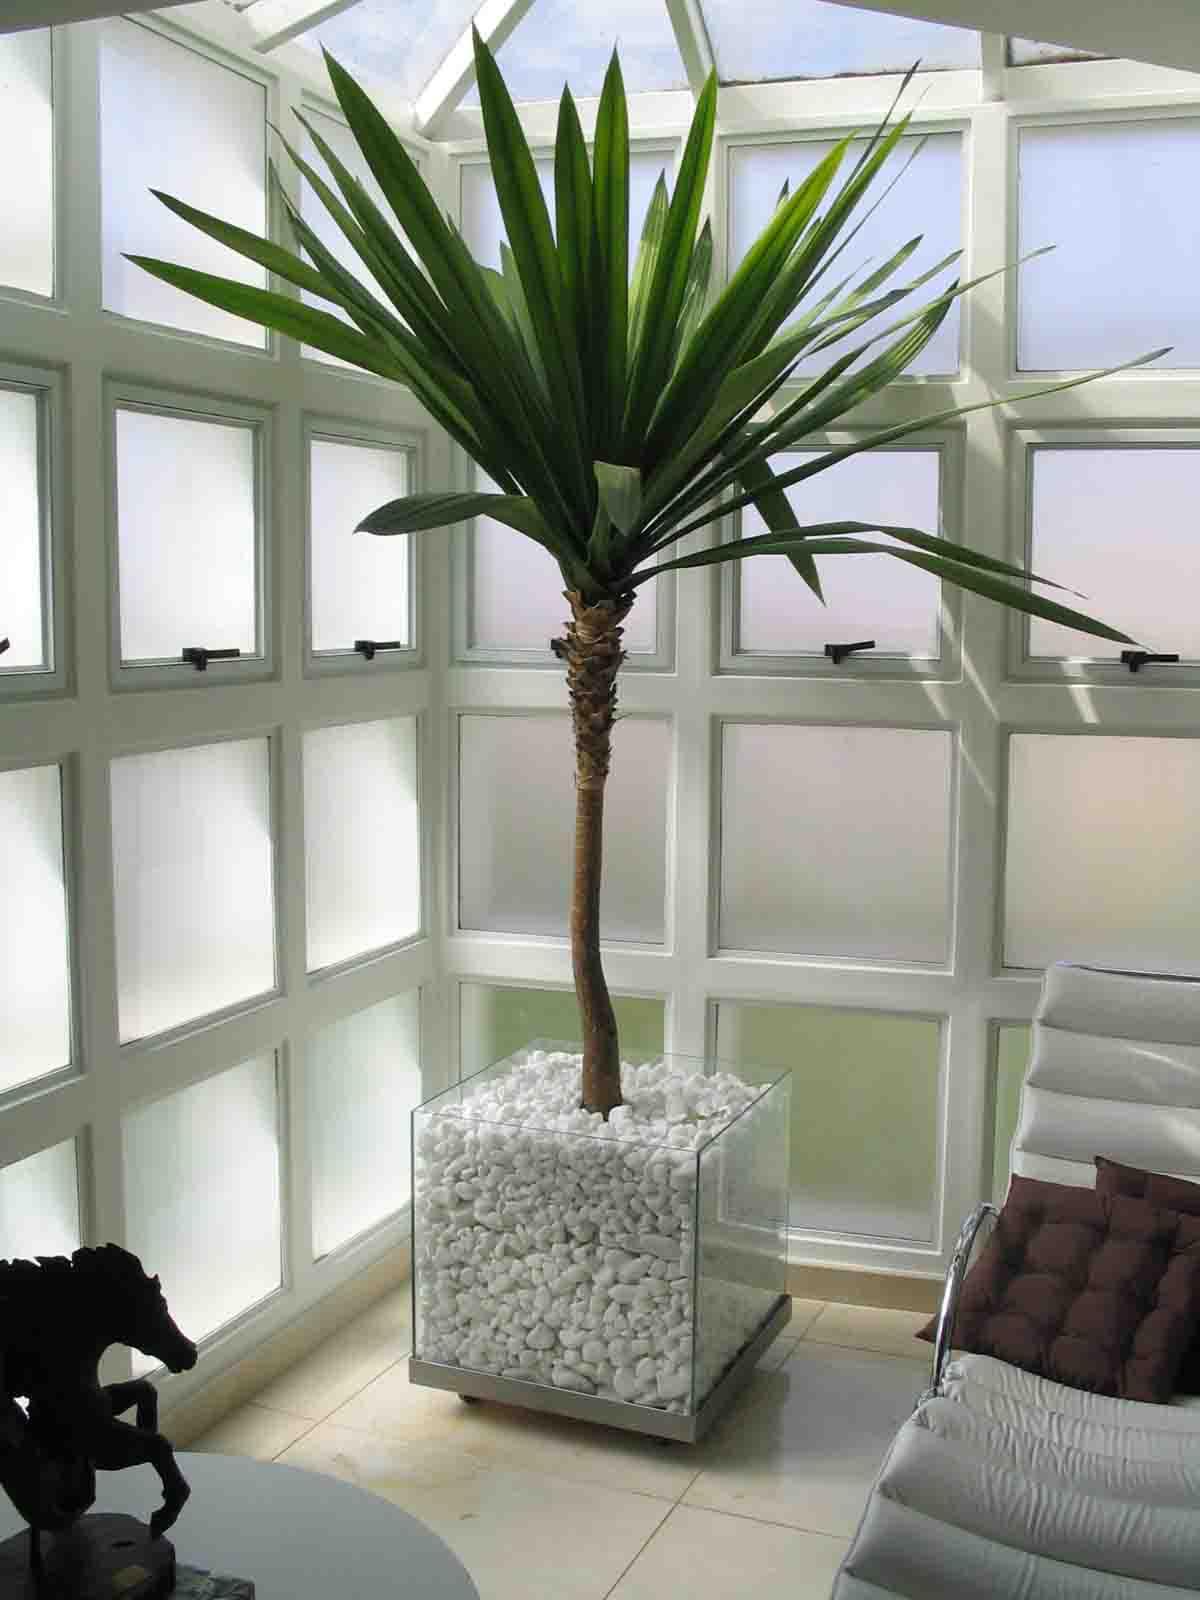 Plantas para ambientes fechados fotos dicas para decorar for Decorar online